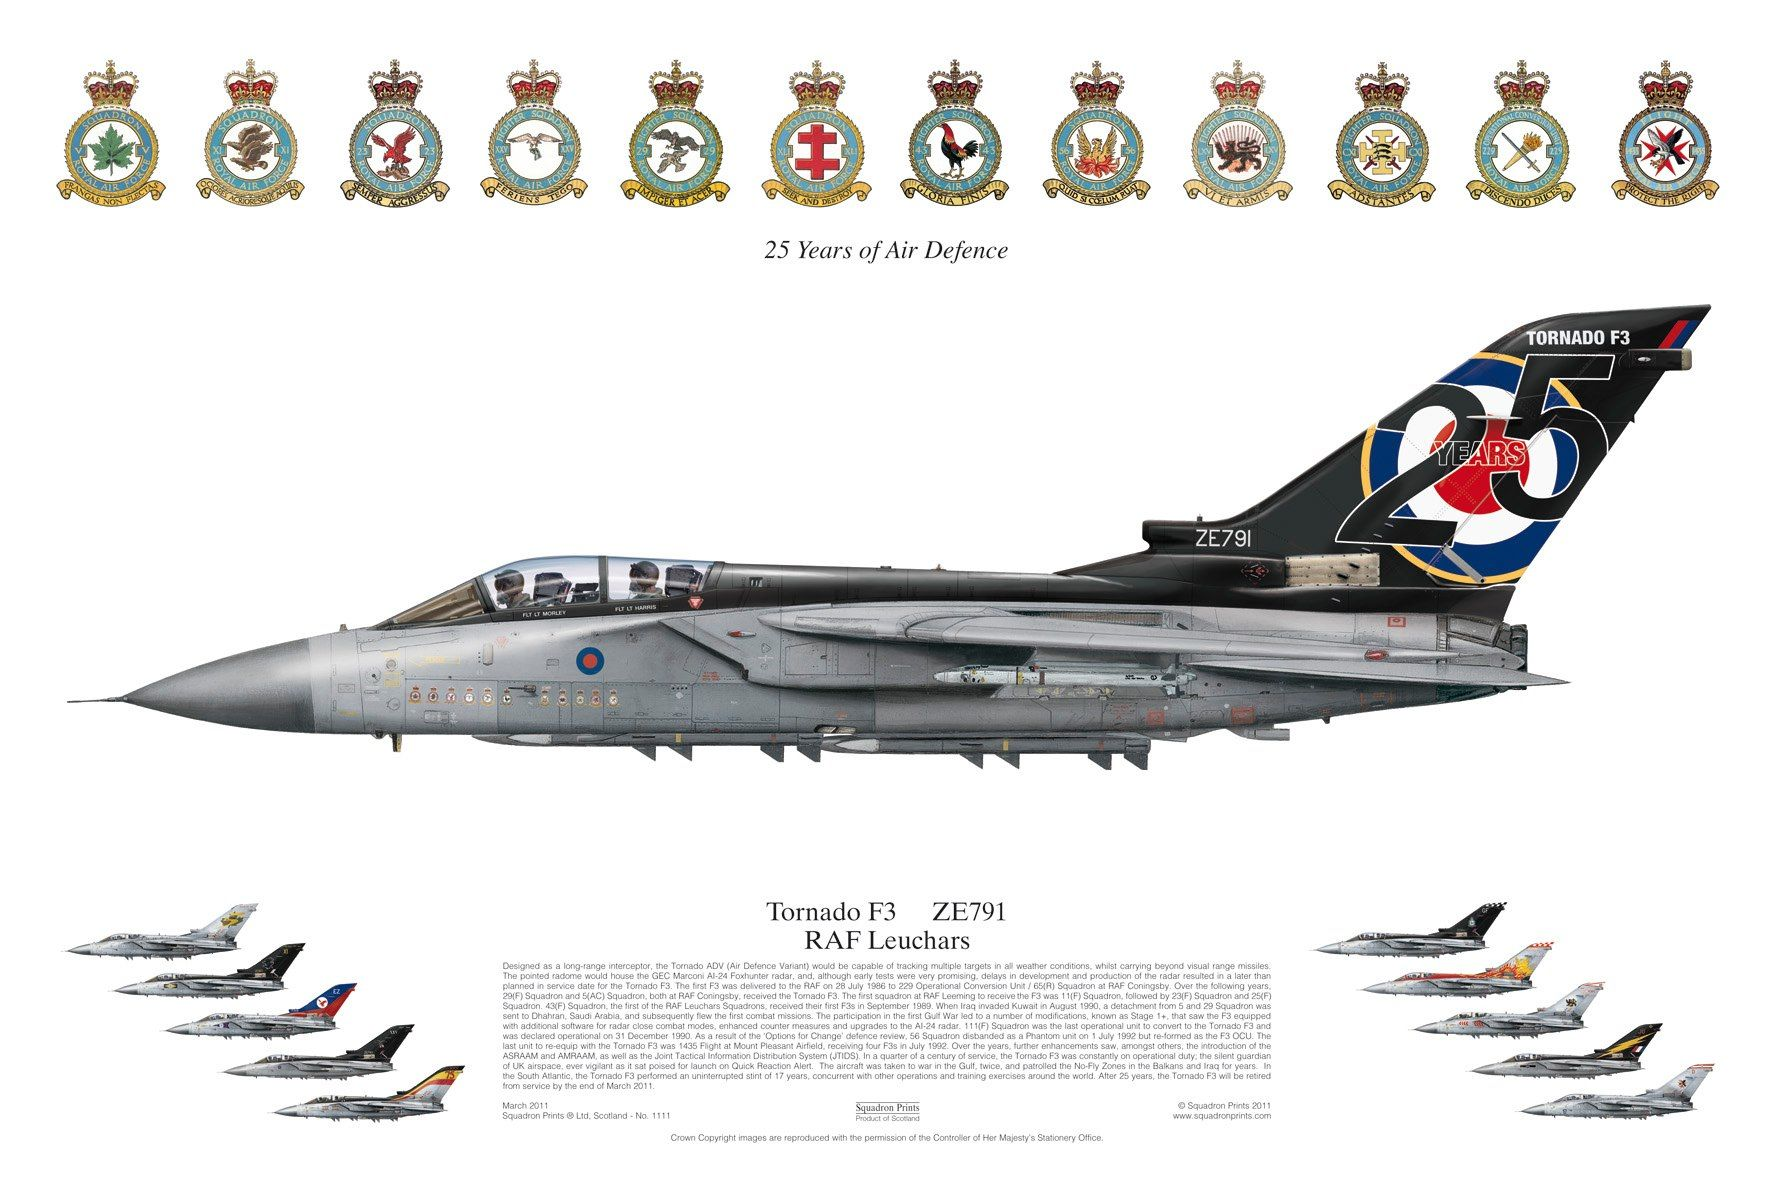 tornado f3 raf leuchars 25 years of air defence squadrons plane liveries flugzeug luft. Black Bedroom Furniture Sets. Home Design Ideas